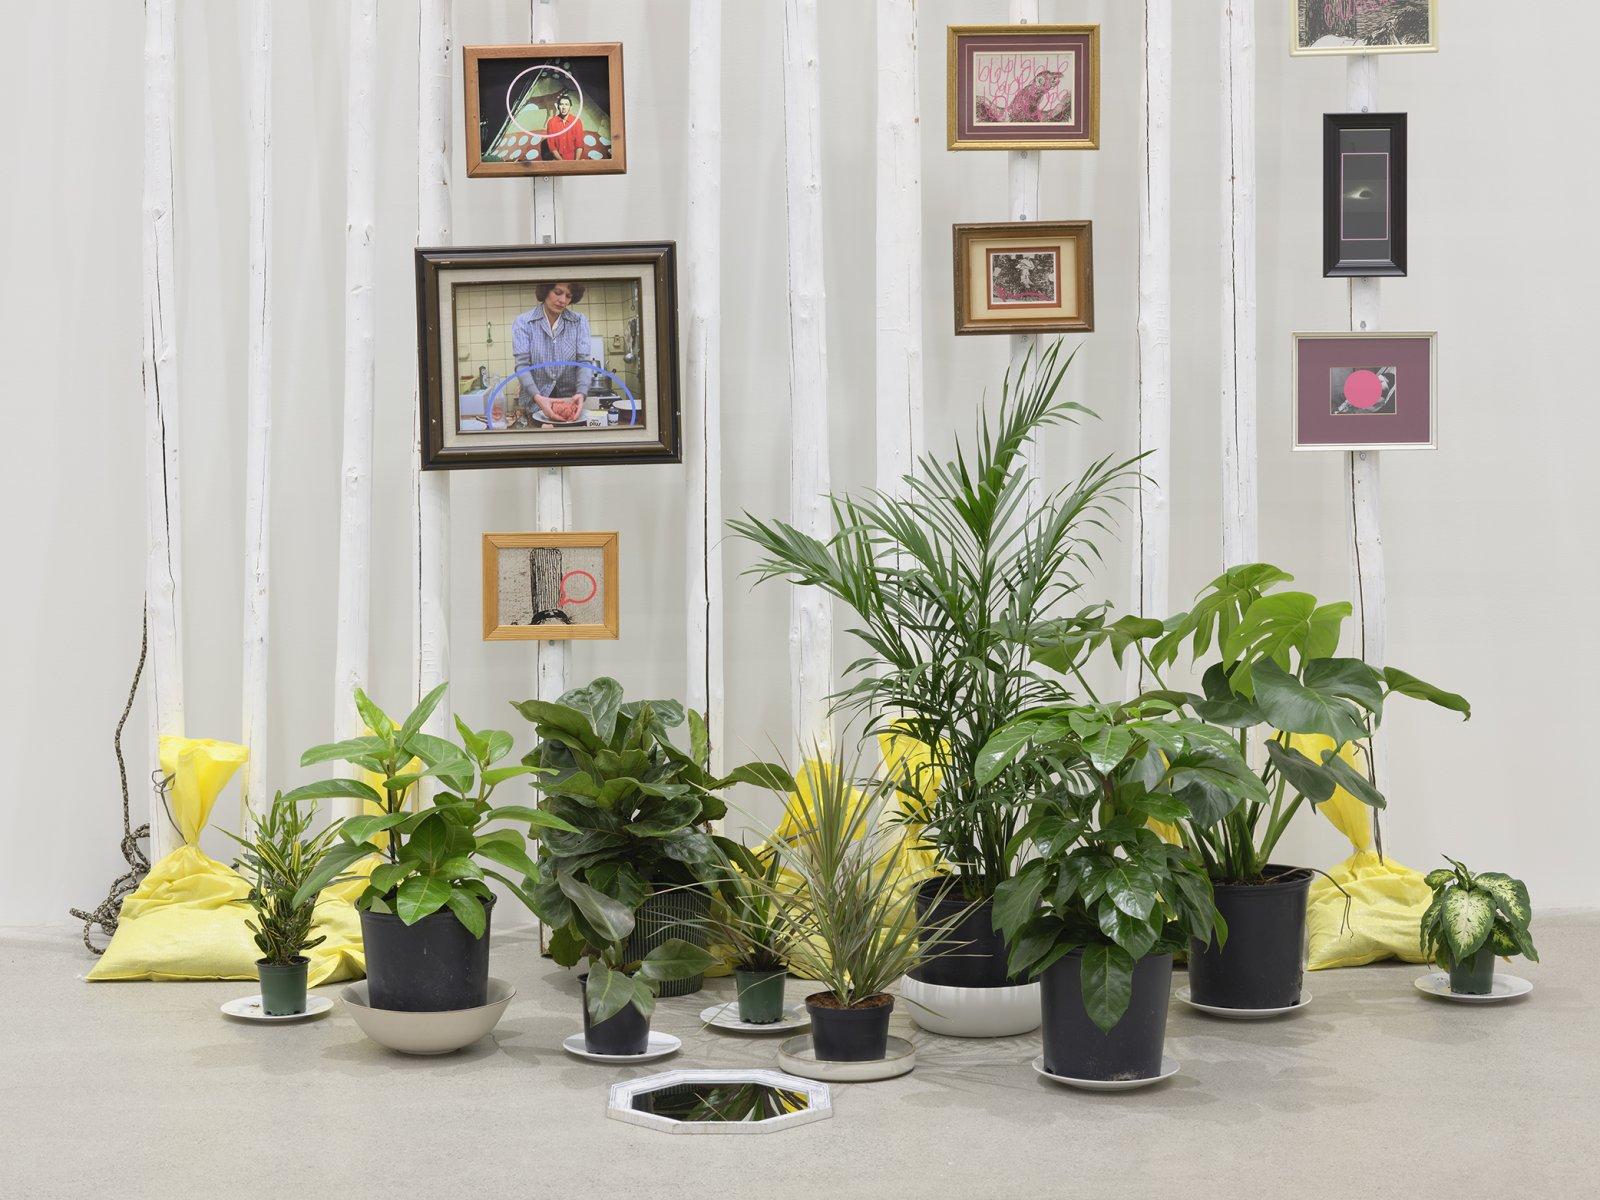 Duane Linklater, action at a distance (detail), 2020, teepee poles, paint, nylon rope, plants, plates, ceramics, sandbags, frames, 12 digital prints, mirror, 233 x 102 x 66 in. (592 x 259 x 168 cm)